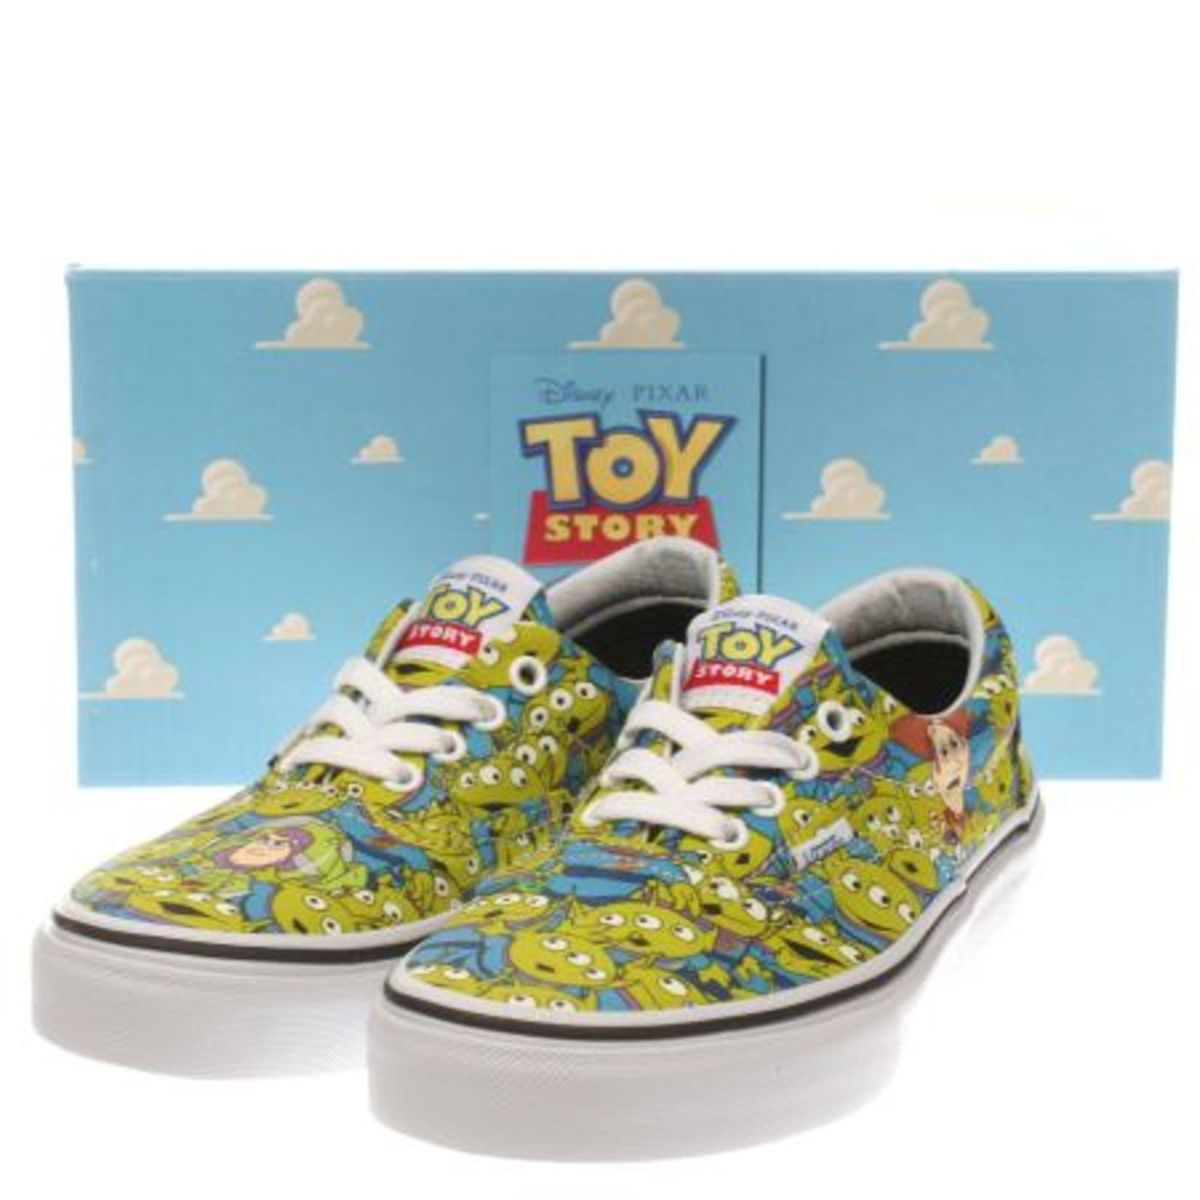 e8dd5439c58 Vans Toy Story Aliens Brilha No Escuro !!!